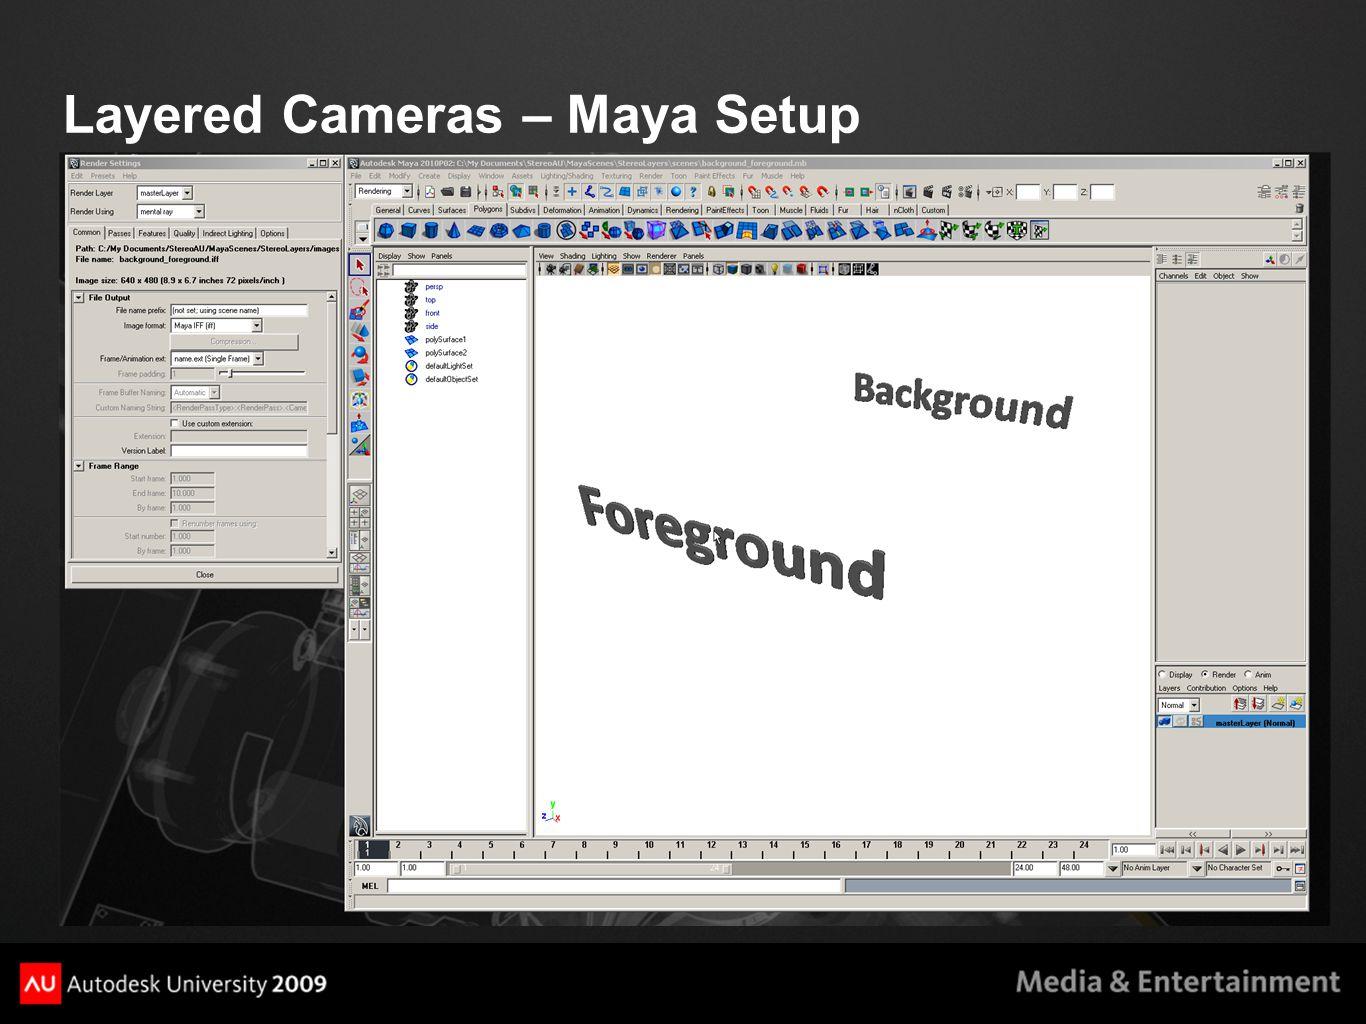 Layered Cameras – Maya Setup